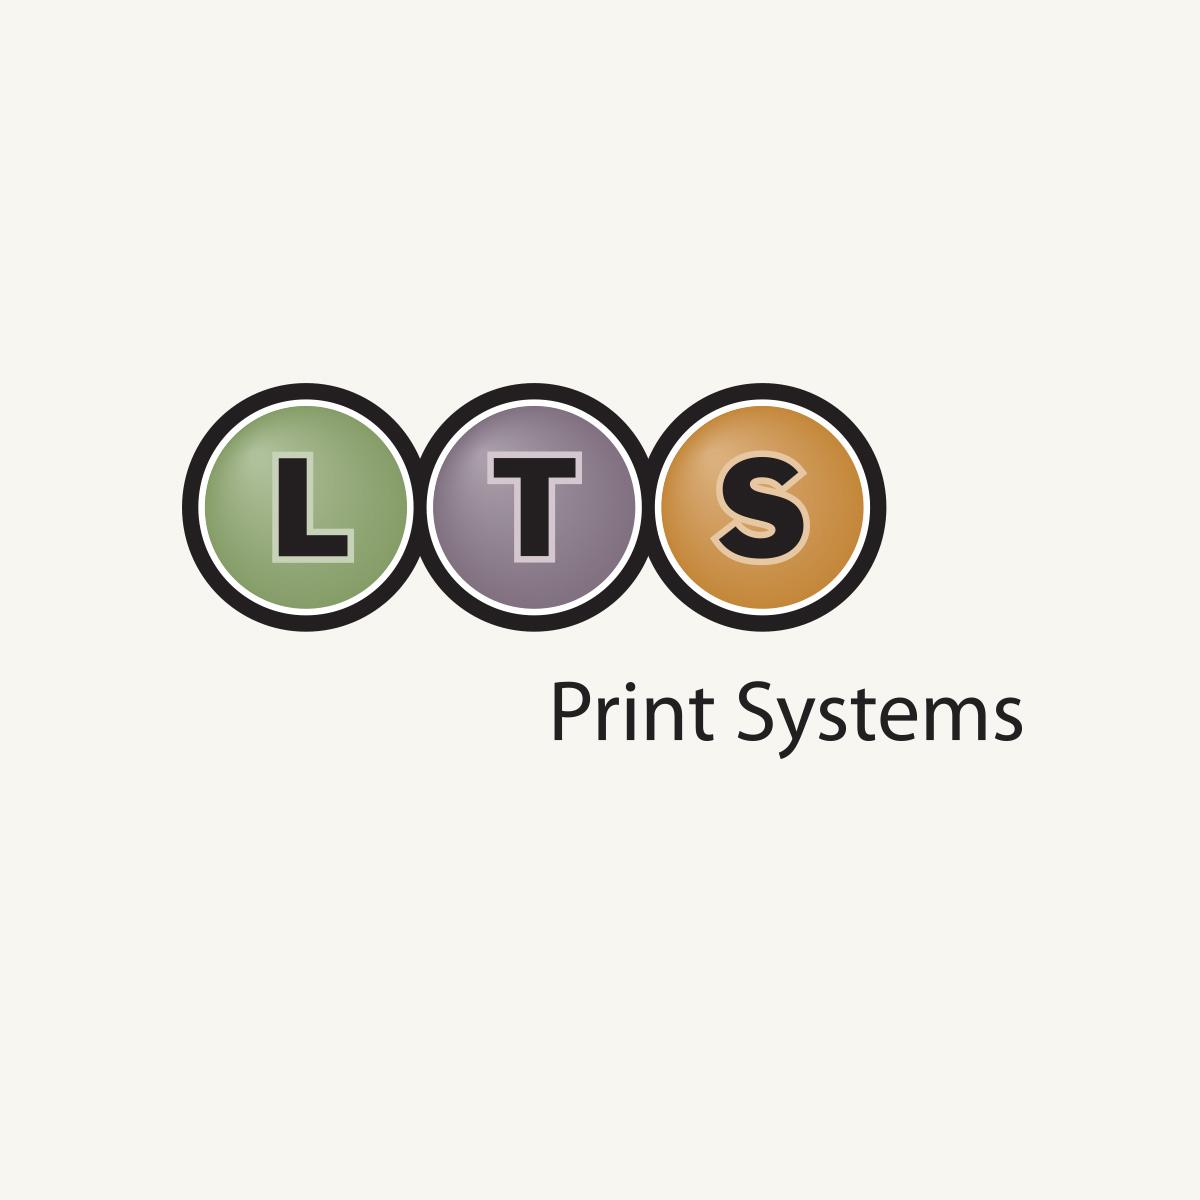 LTS_Print_Systems.jpg